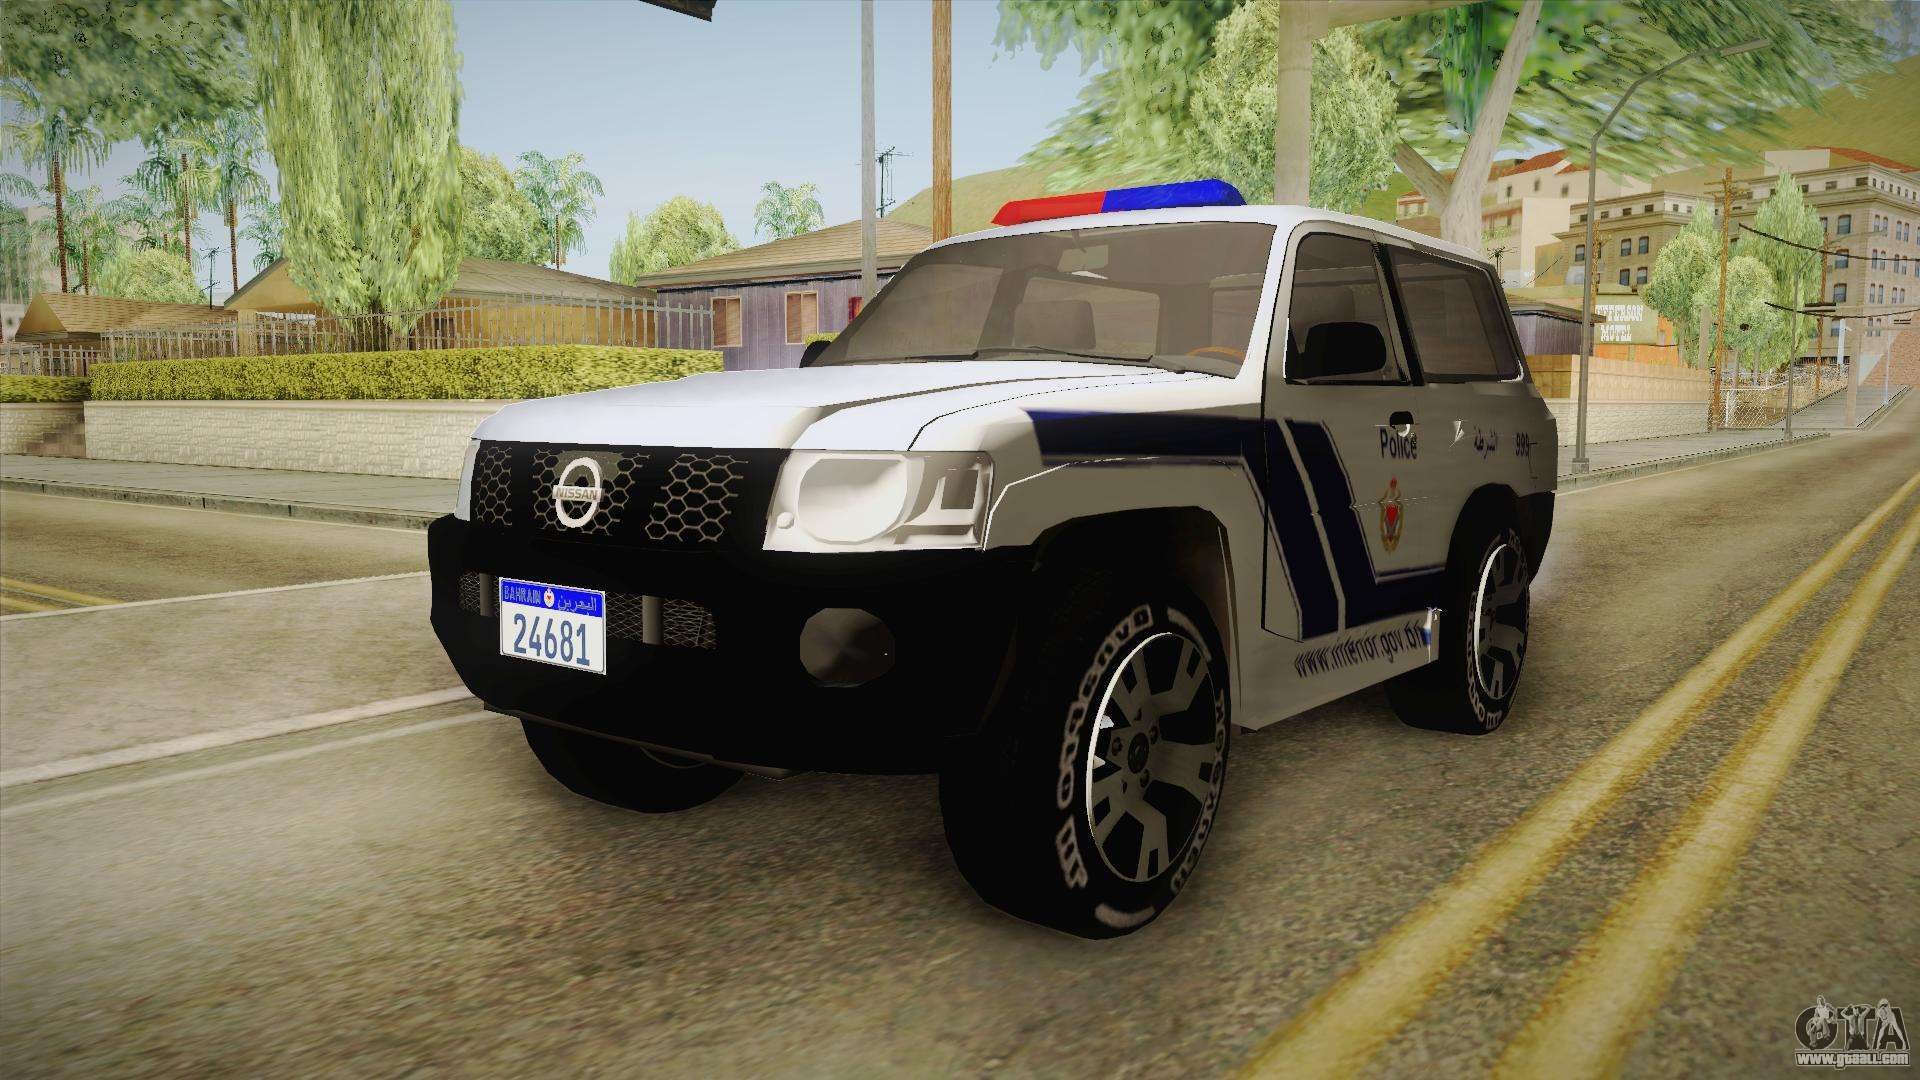 nissan patrol y61 police for gta san andreas. Black Bedroom Furniture Sets. Home Design Ideas